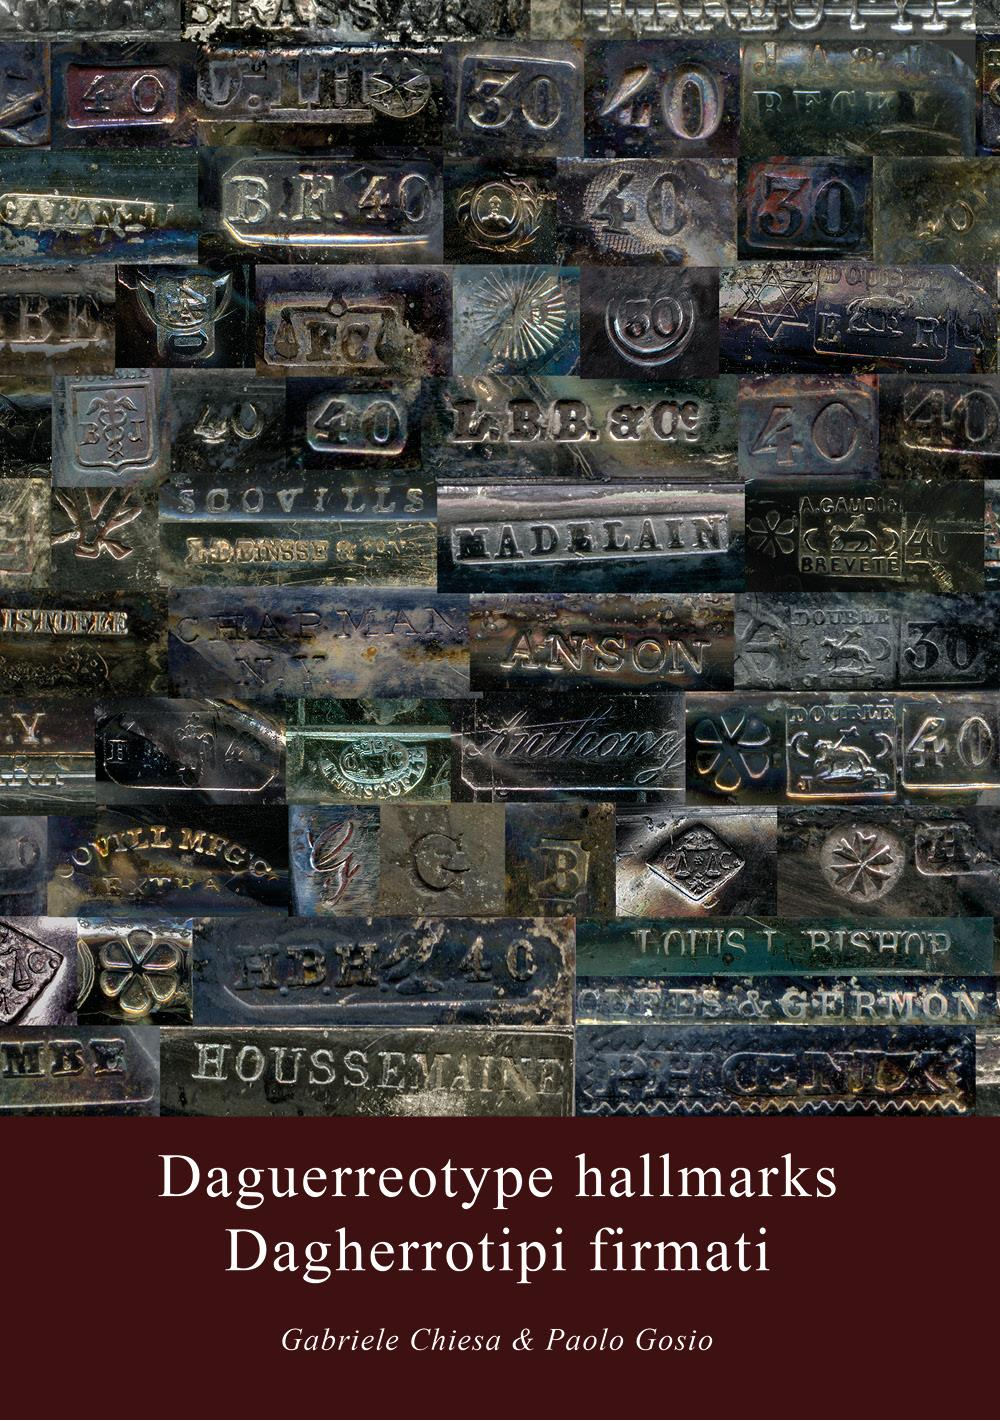 Daguerreotype hallmarks - Dagherrotipi firmati